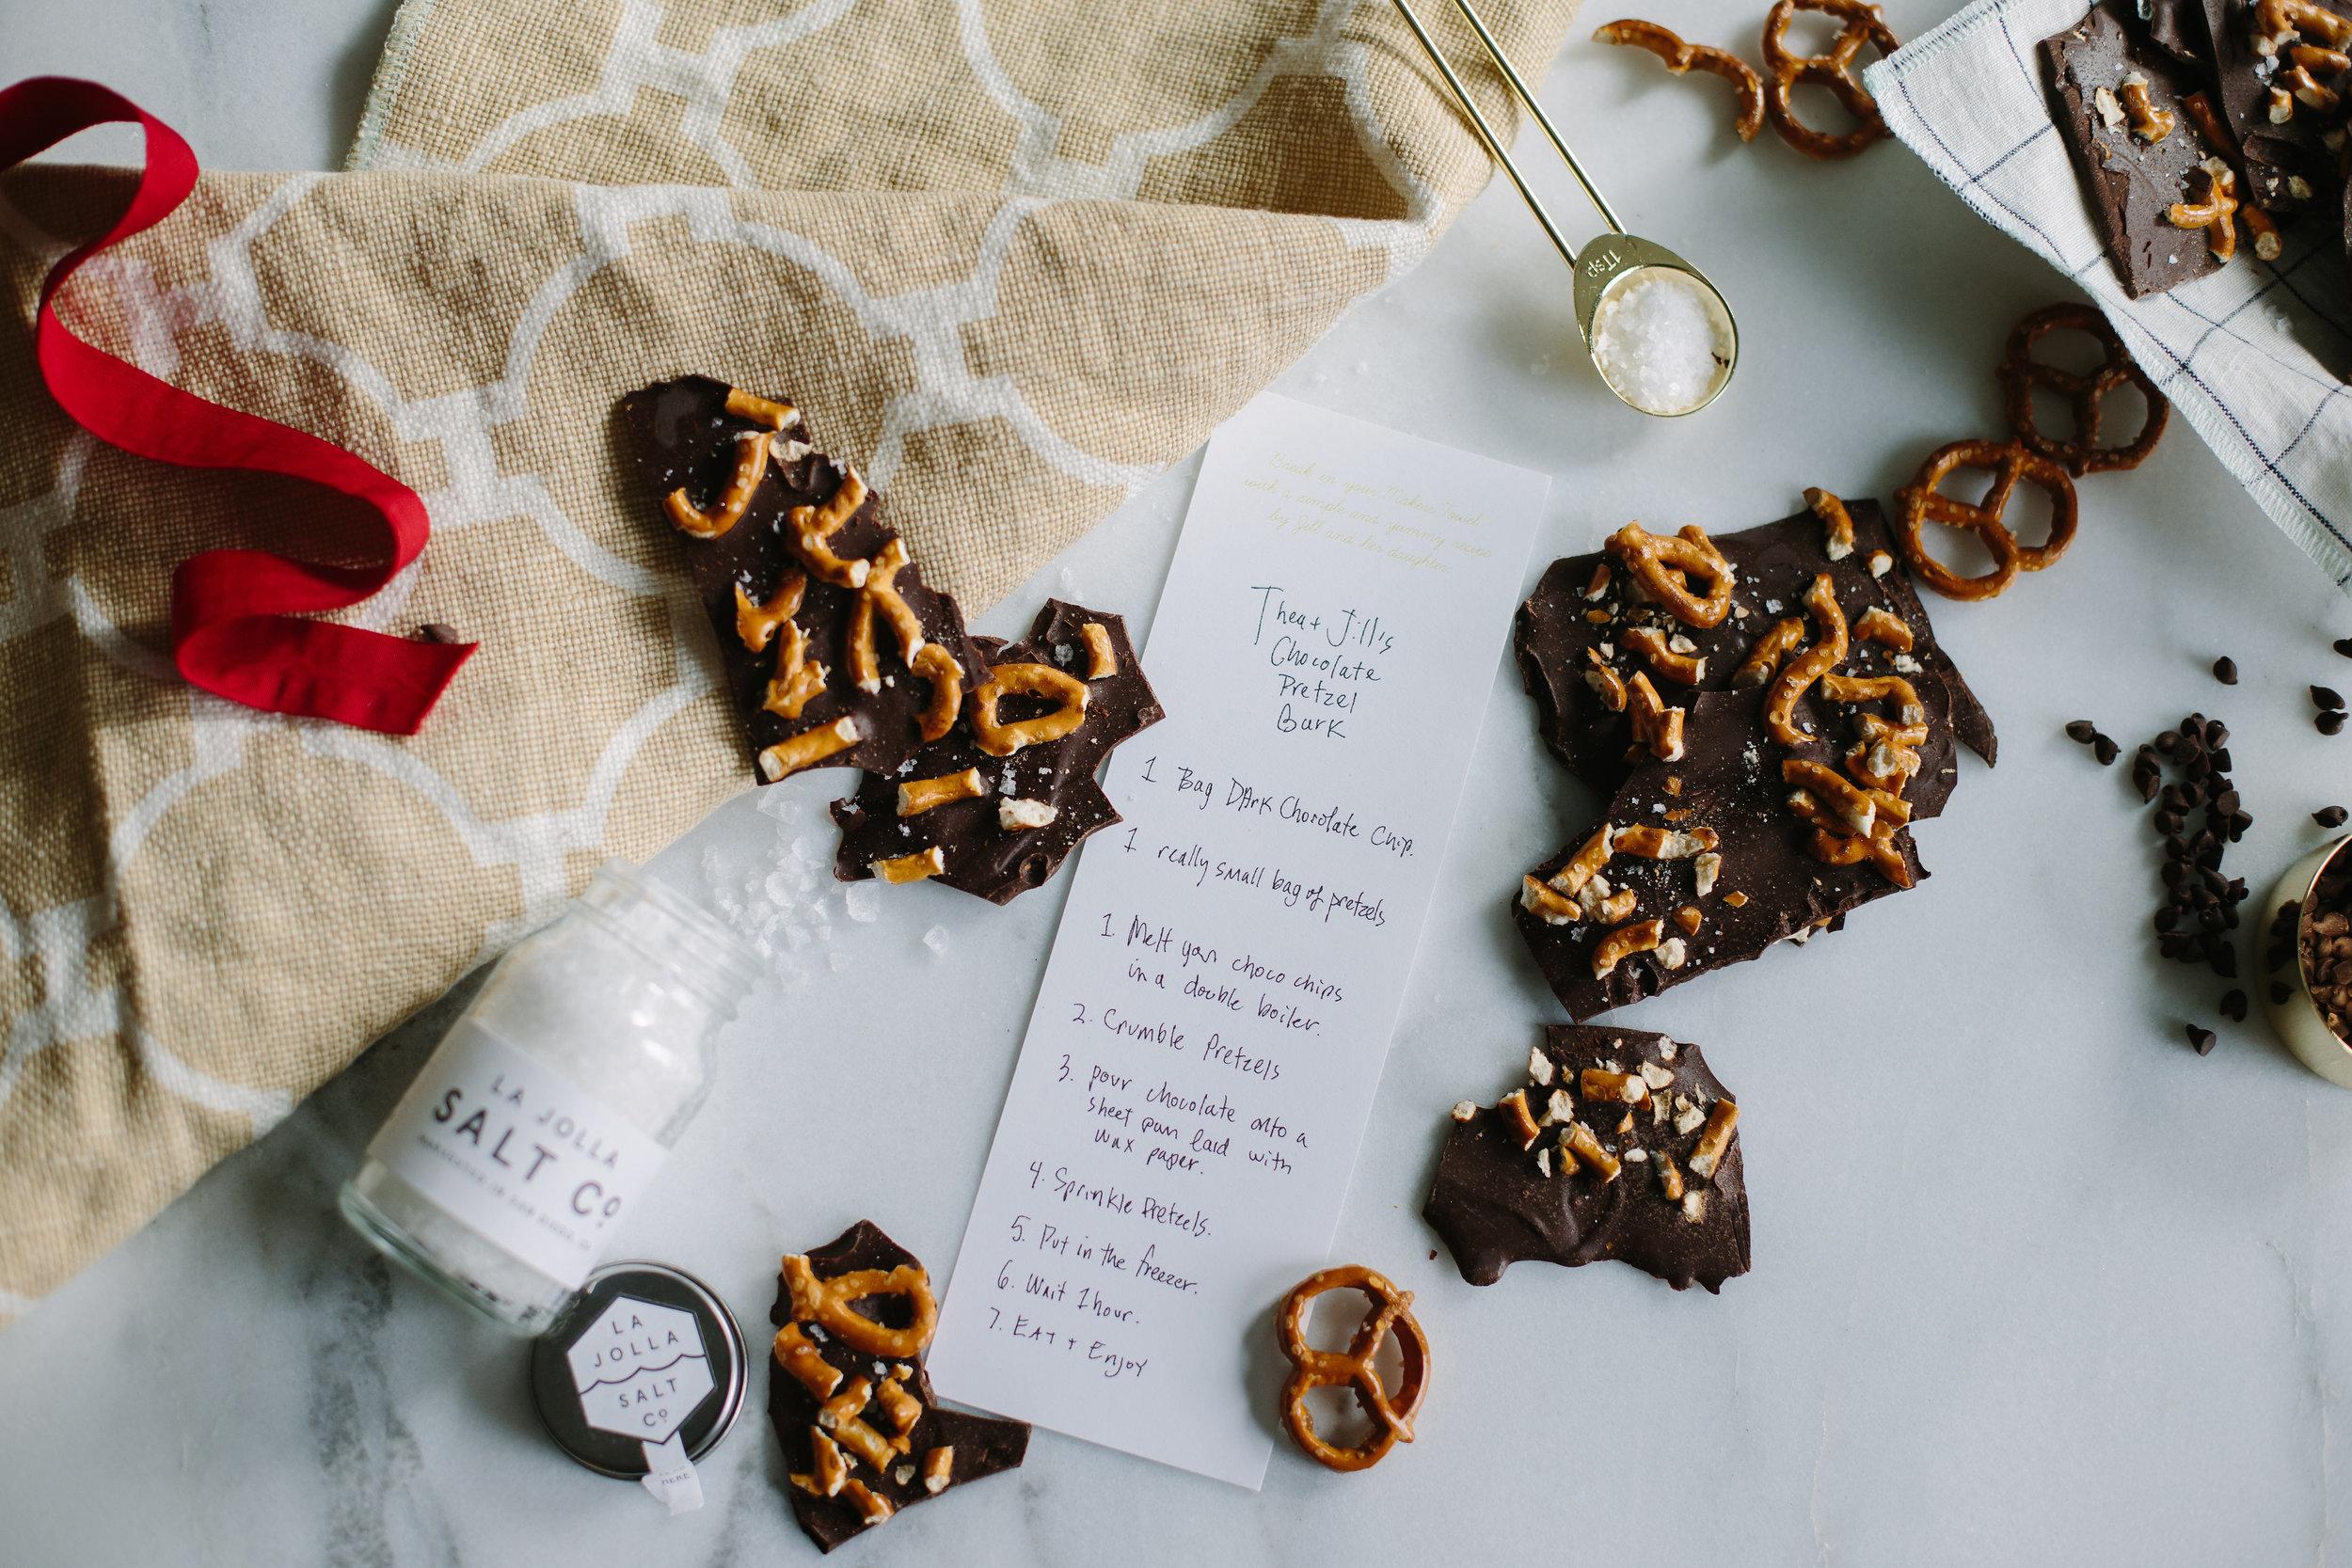 jill-rosenwald-boston-towel-linen-holiday-recipe-fun-easy-chocolate